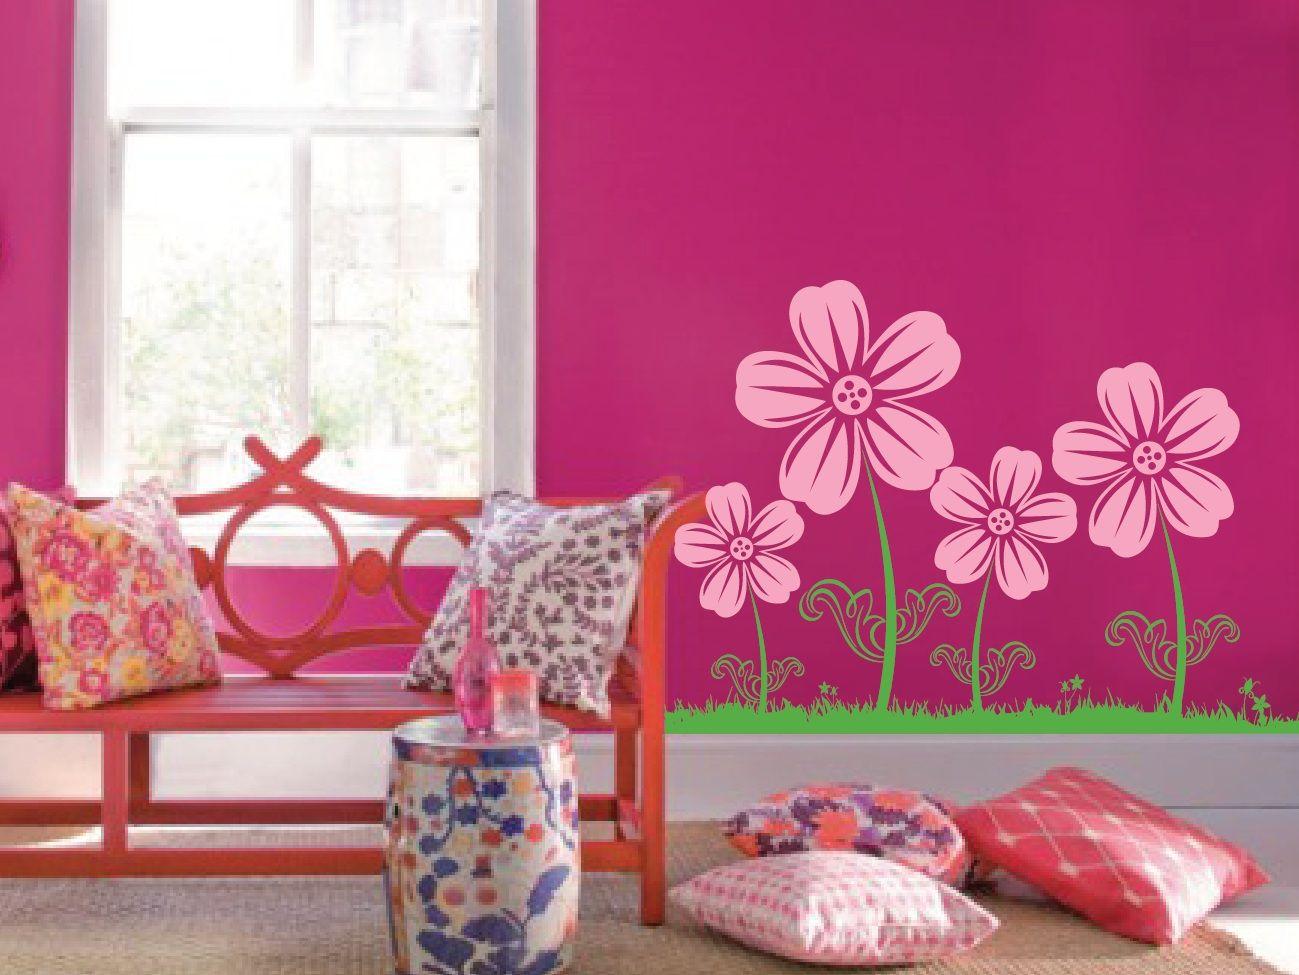 Wall Flower Nursery Decal 1123